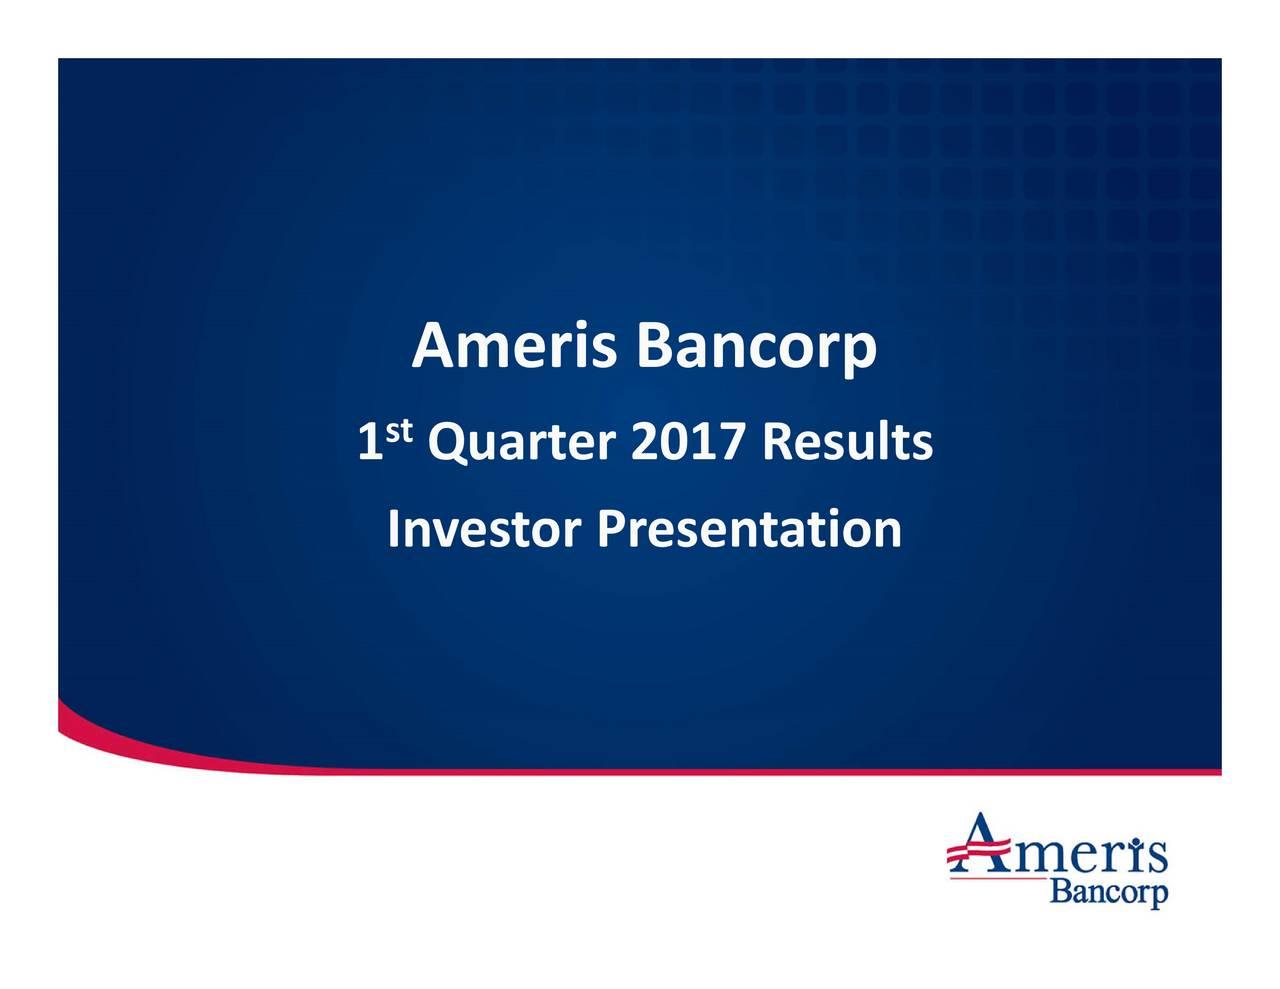 anc017resentation Amerisarter s1 Investor